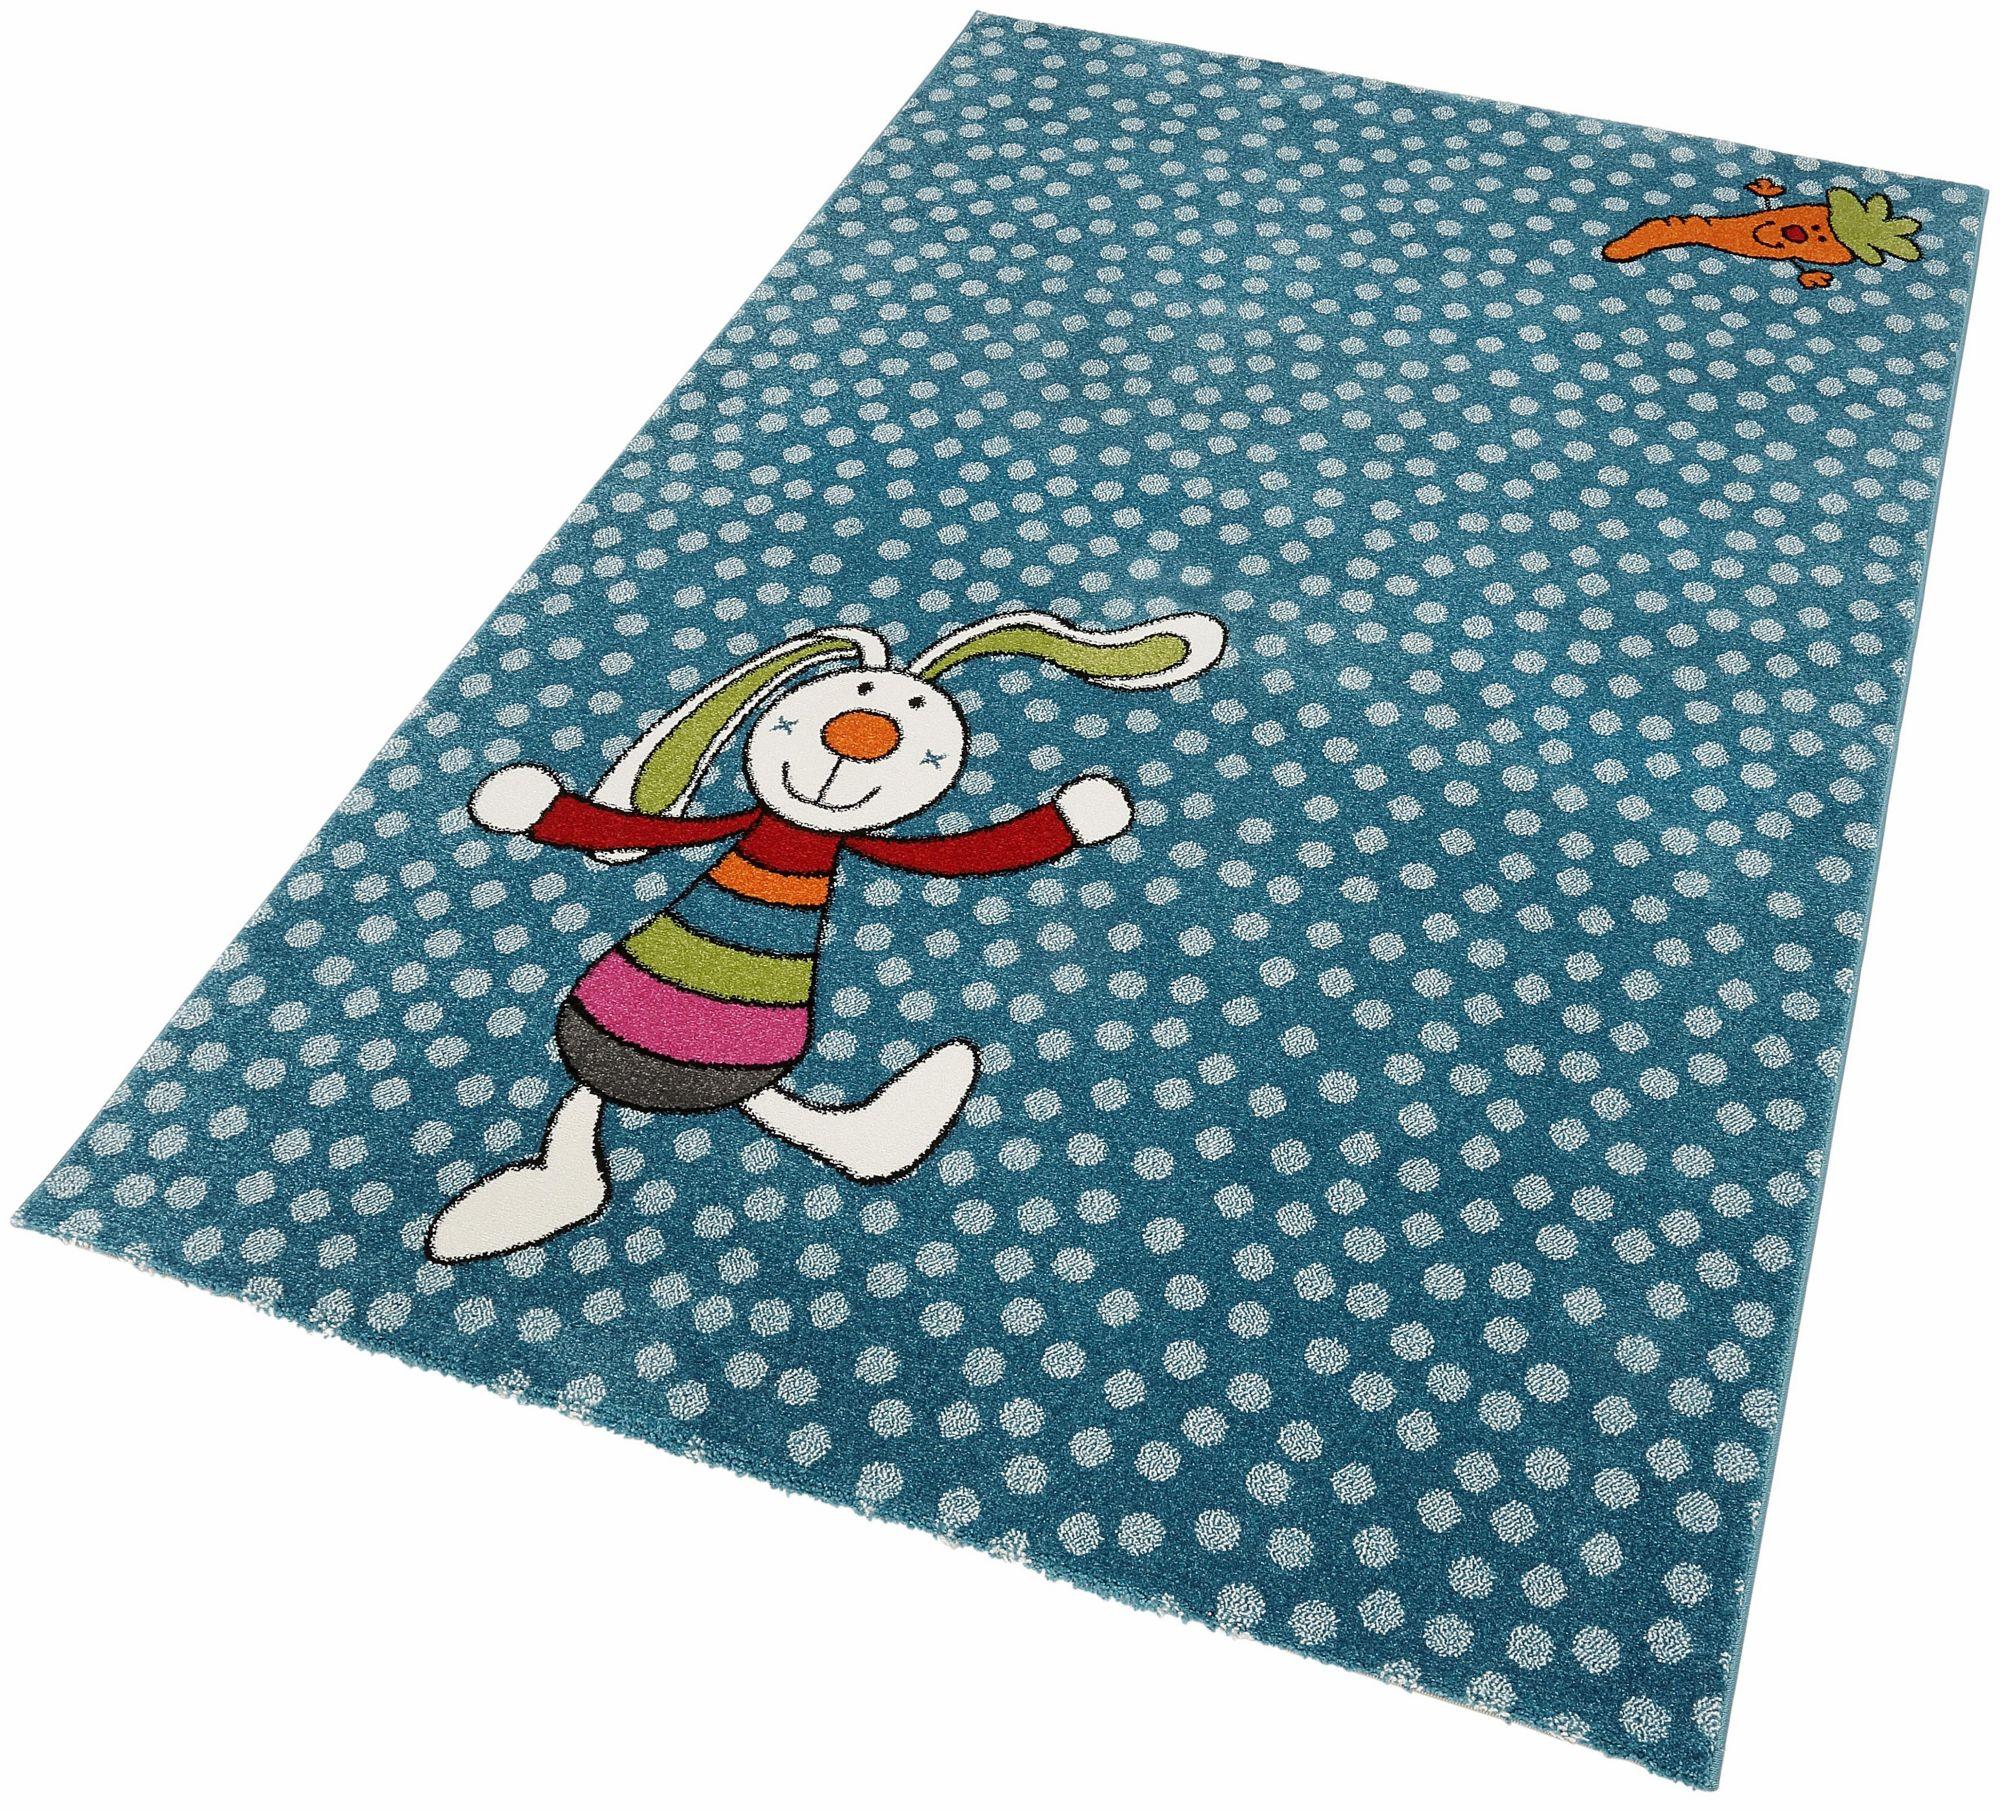 Kinder-Teppich, Sigikid, »Rainbow Rabbit«